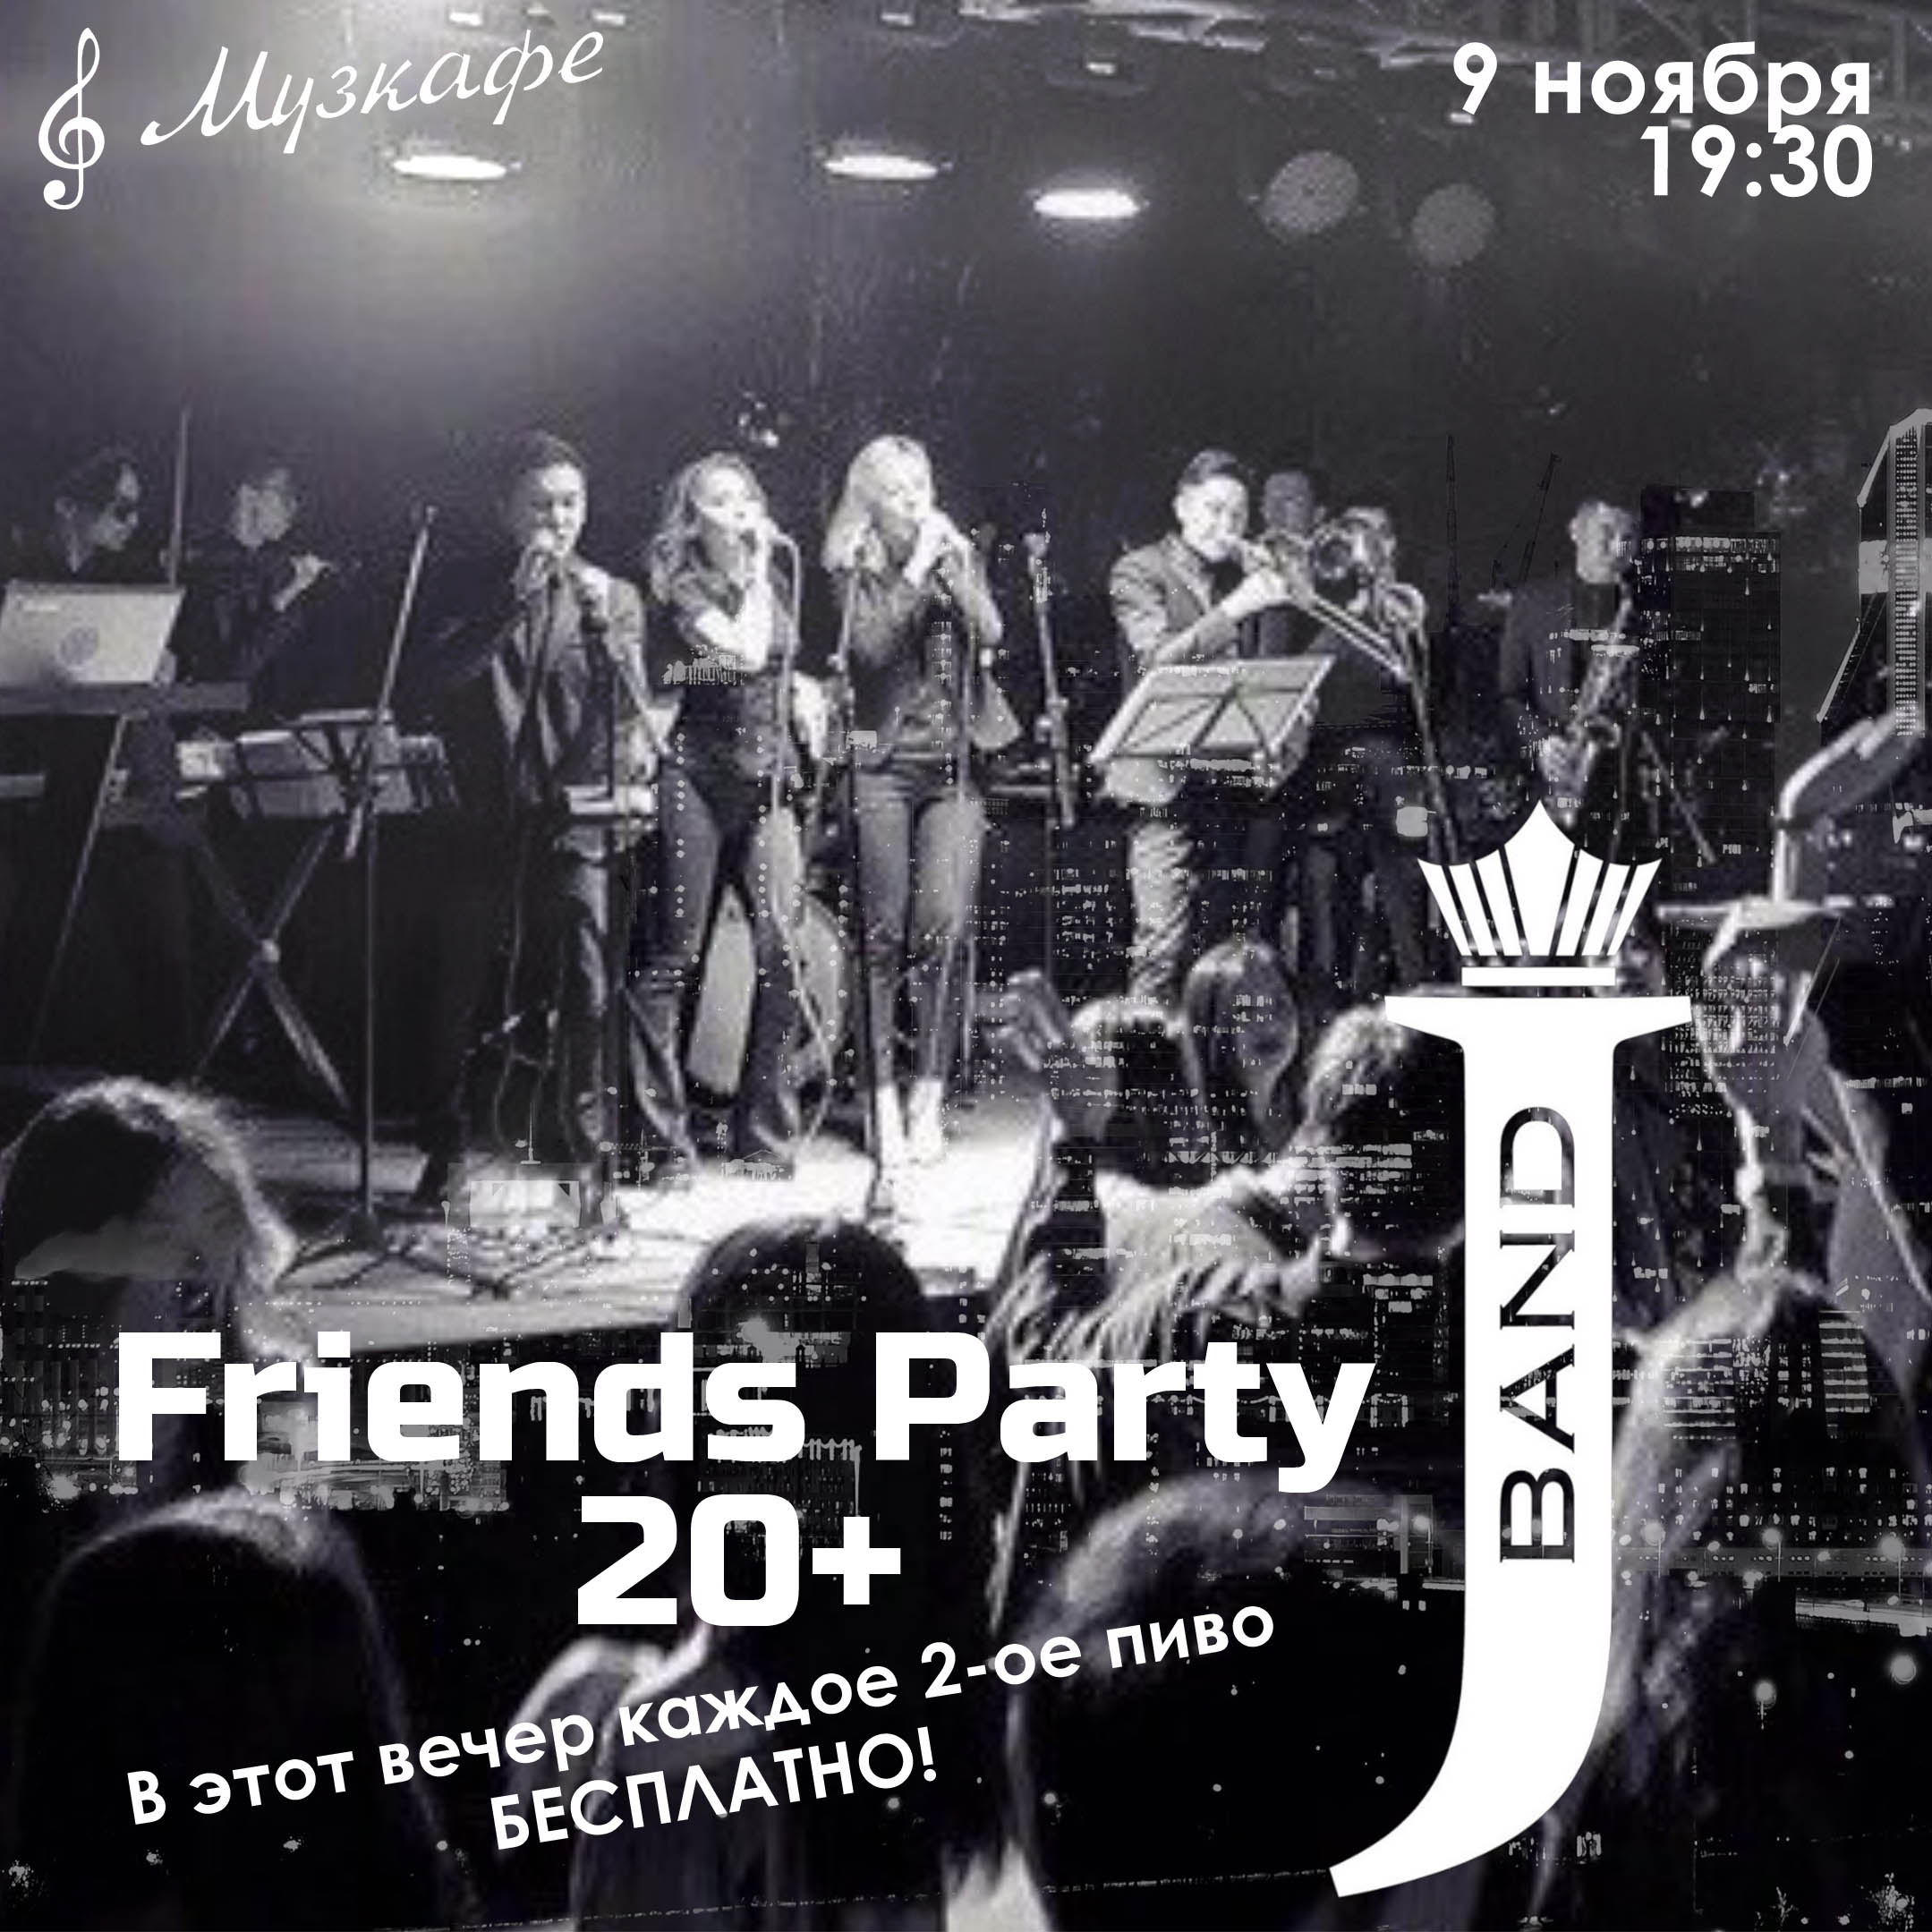 Friends Party 20+